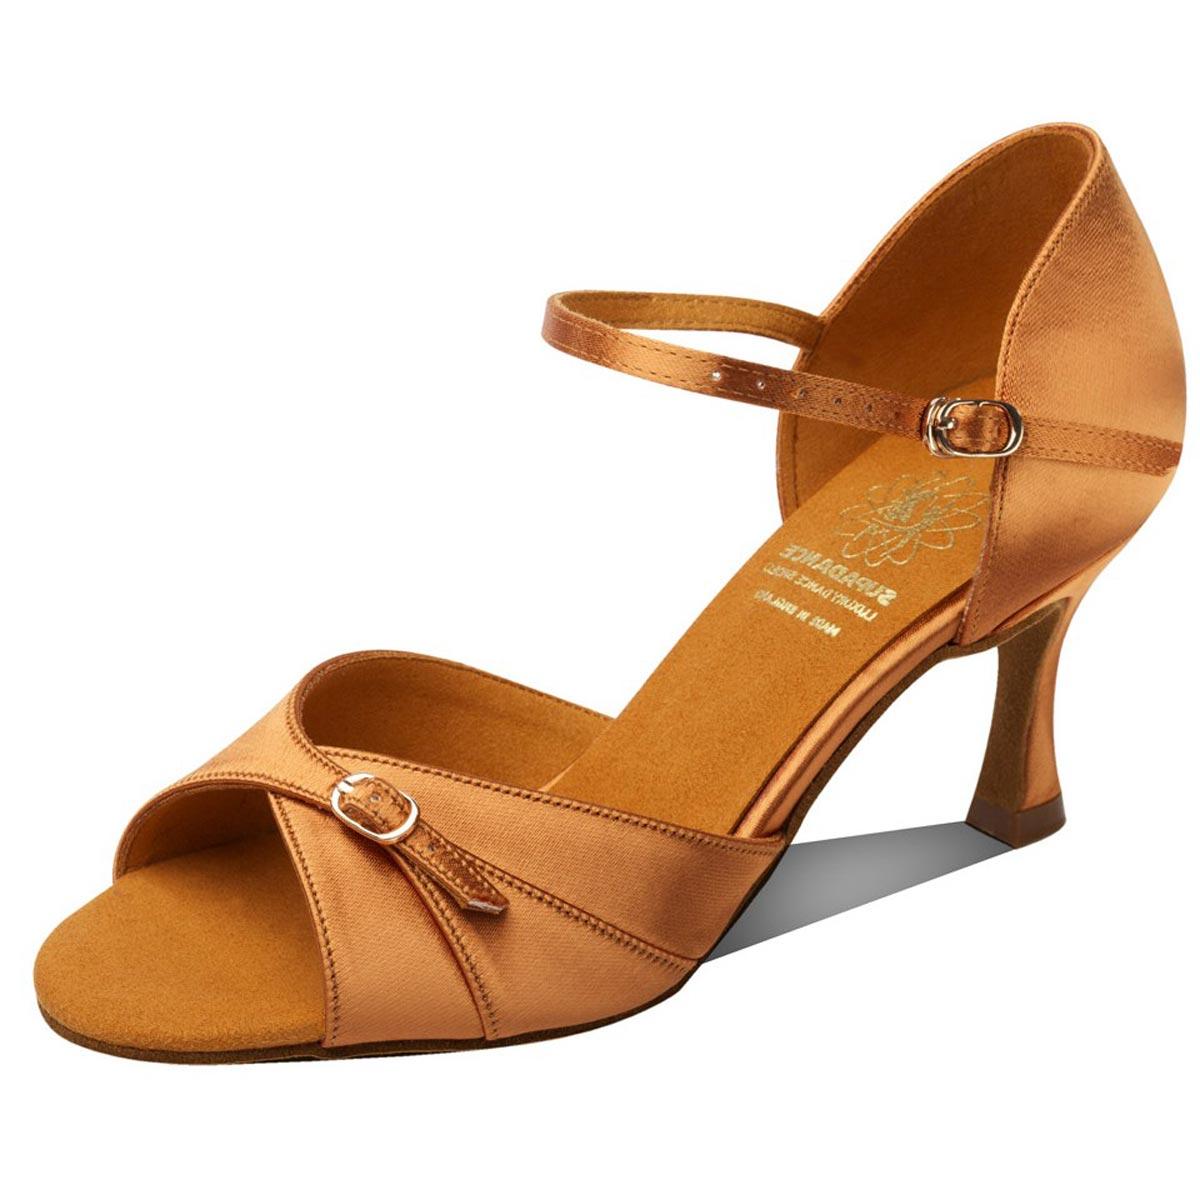 Supadance - Ladies Dance Shoes 7843